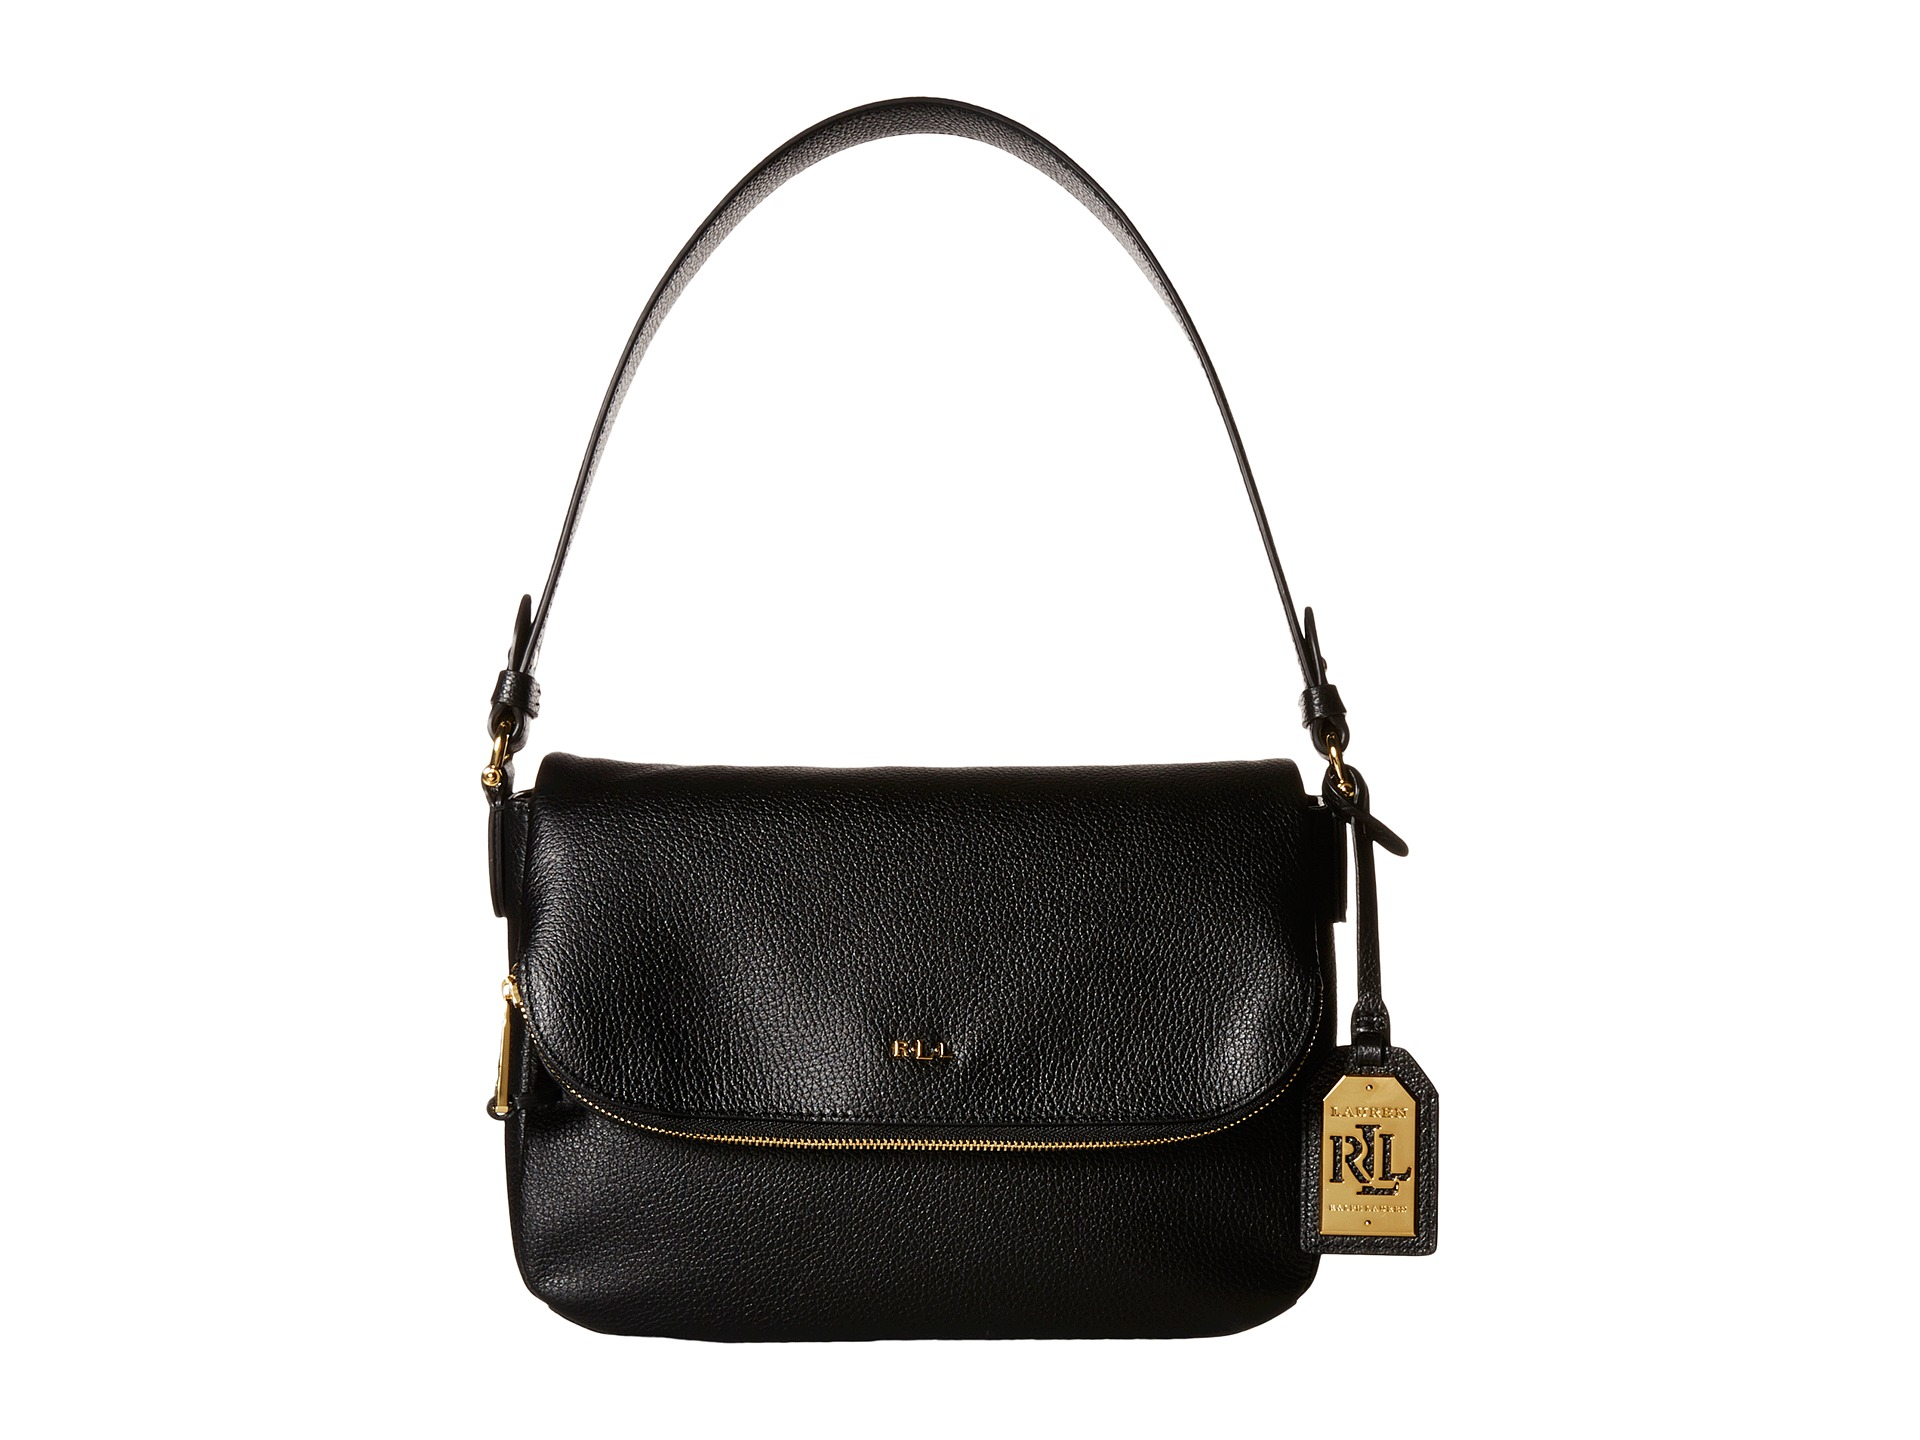 e5f3a42fb2d7 Lyst - Lauren by Ralph Lauren Harrington Shoulder Bag in Black